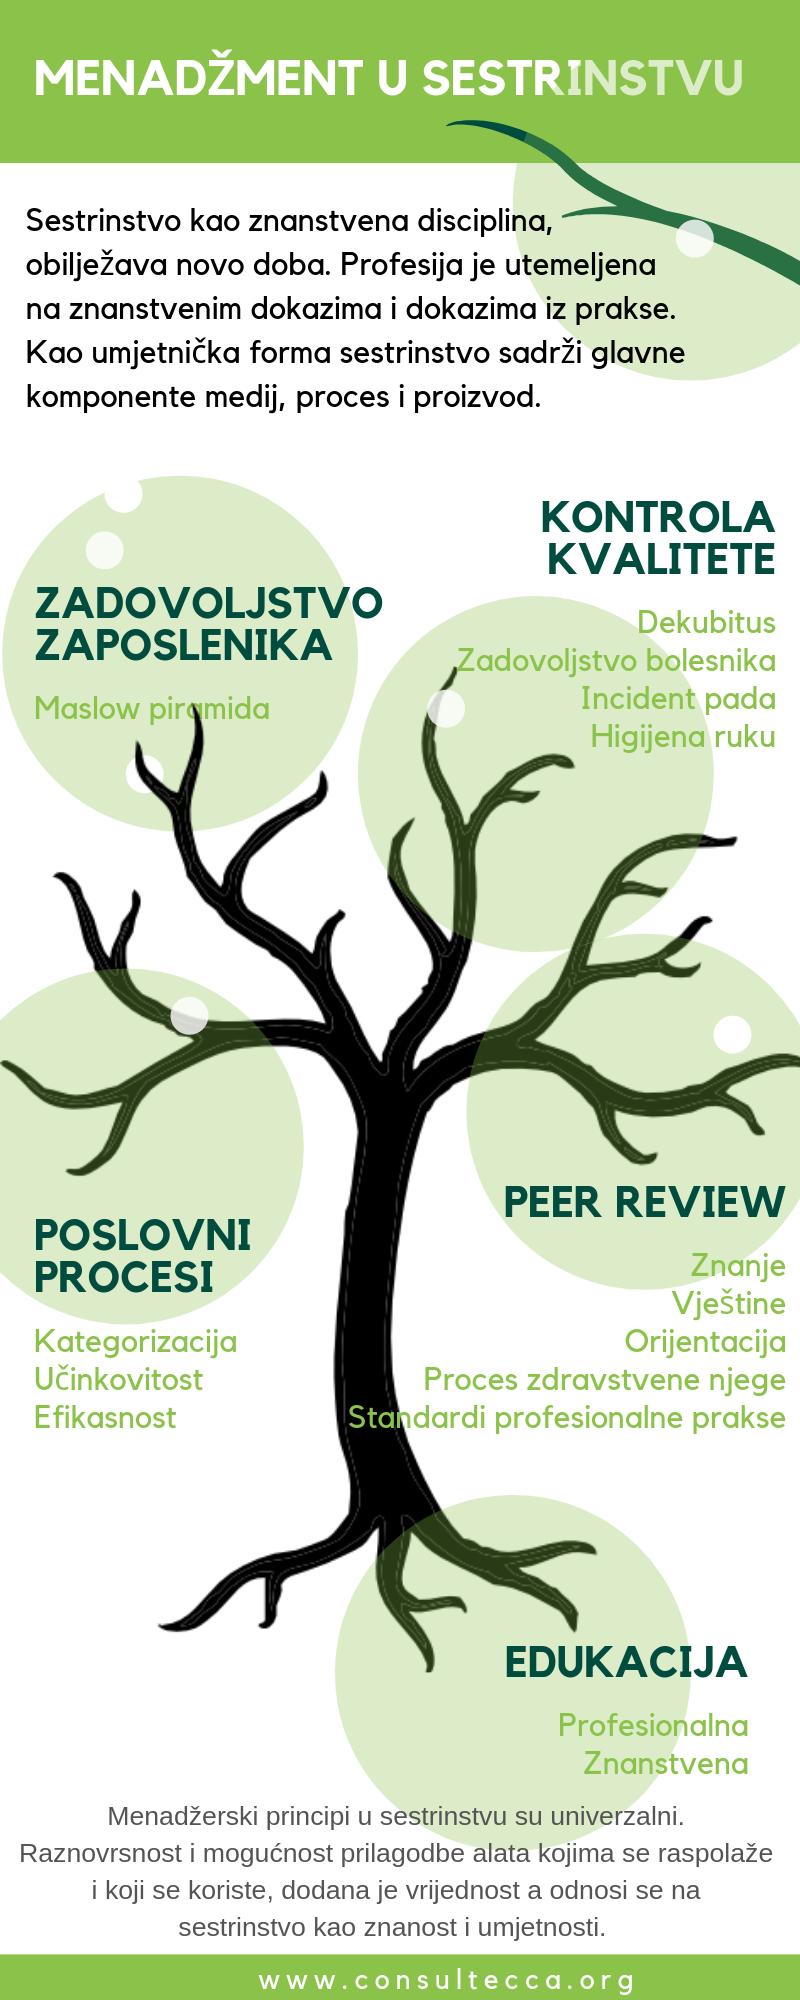 Poslovni procesi, Zadovolsjtvo zaposlenika, Kontrola kvalitete, Peer review, Edukacija